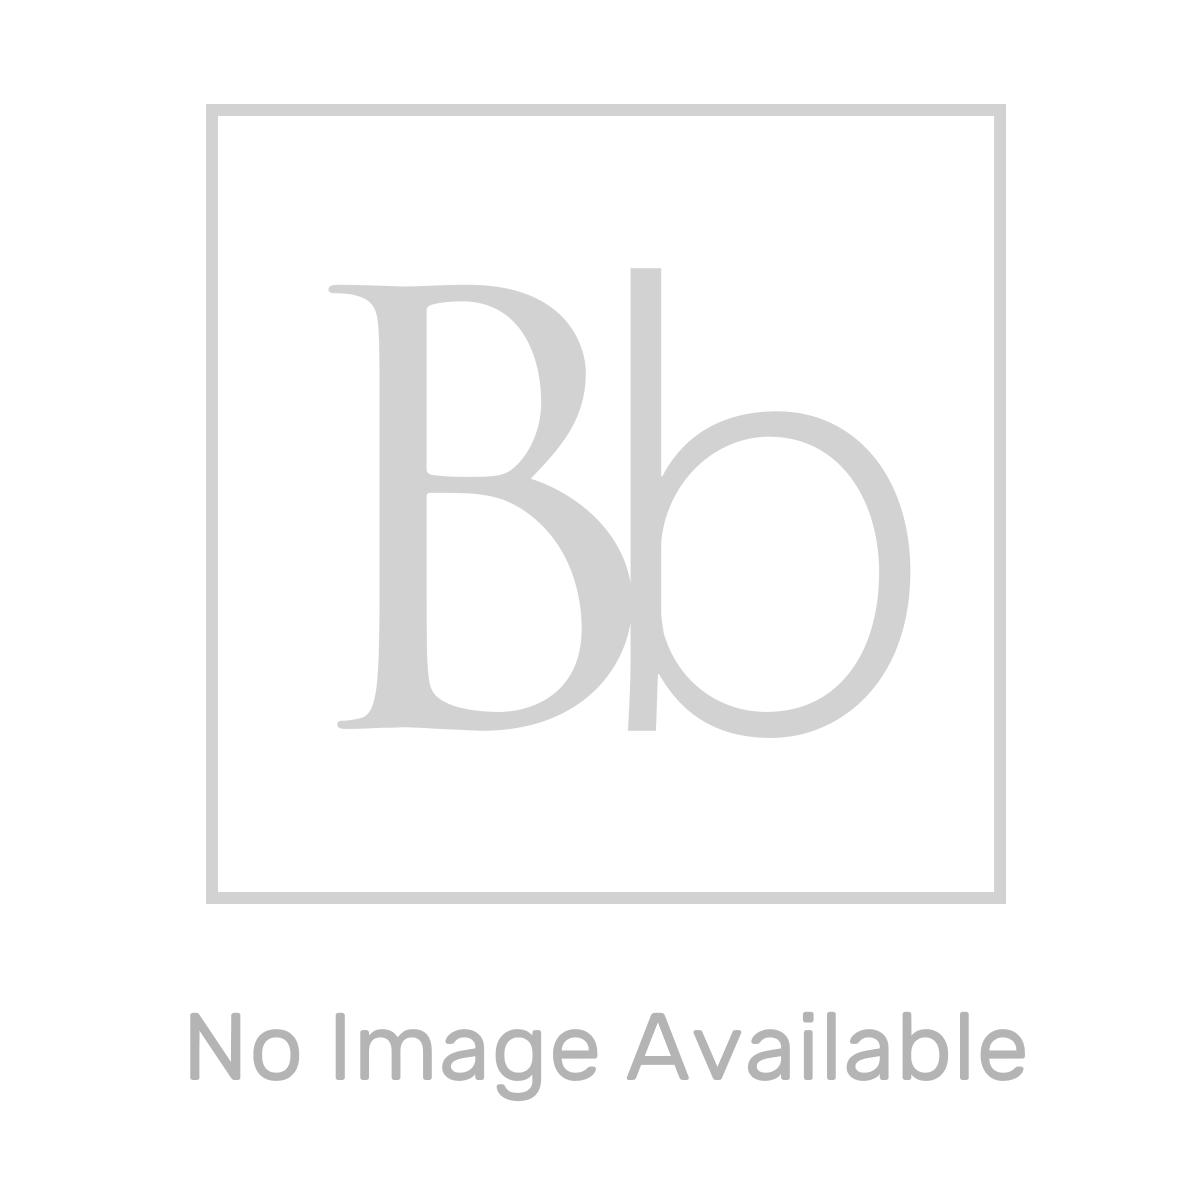 RAK Surface Charcoal Matt Tile 750 x 750mm Lifestyle